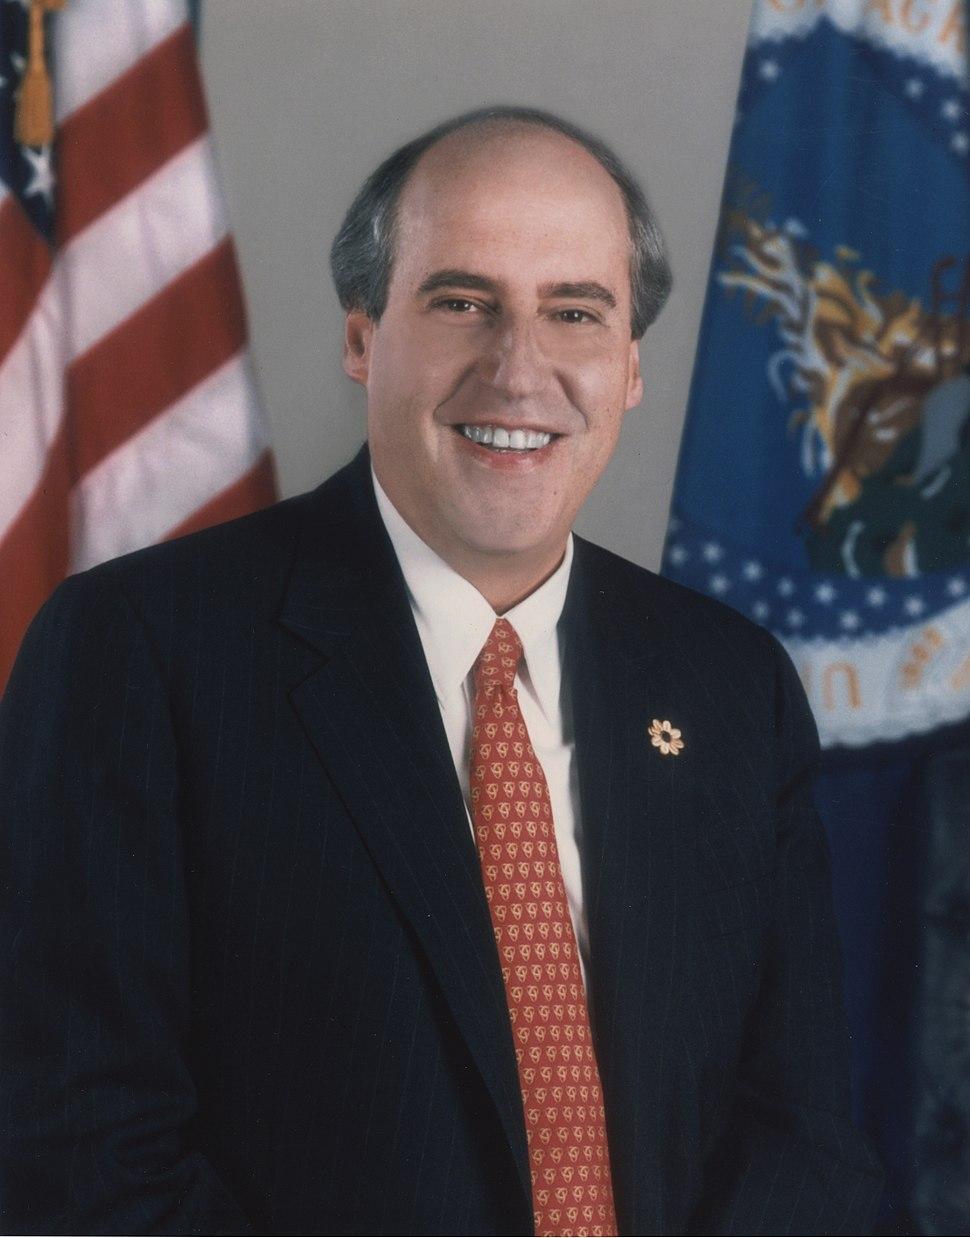 Dan Glickman, 26th Secretary of Agriculture, January 1995 - 2001. - Flickr - USDAgov